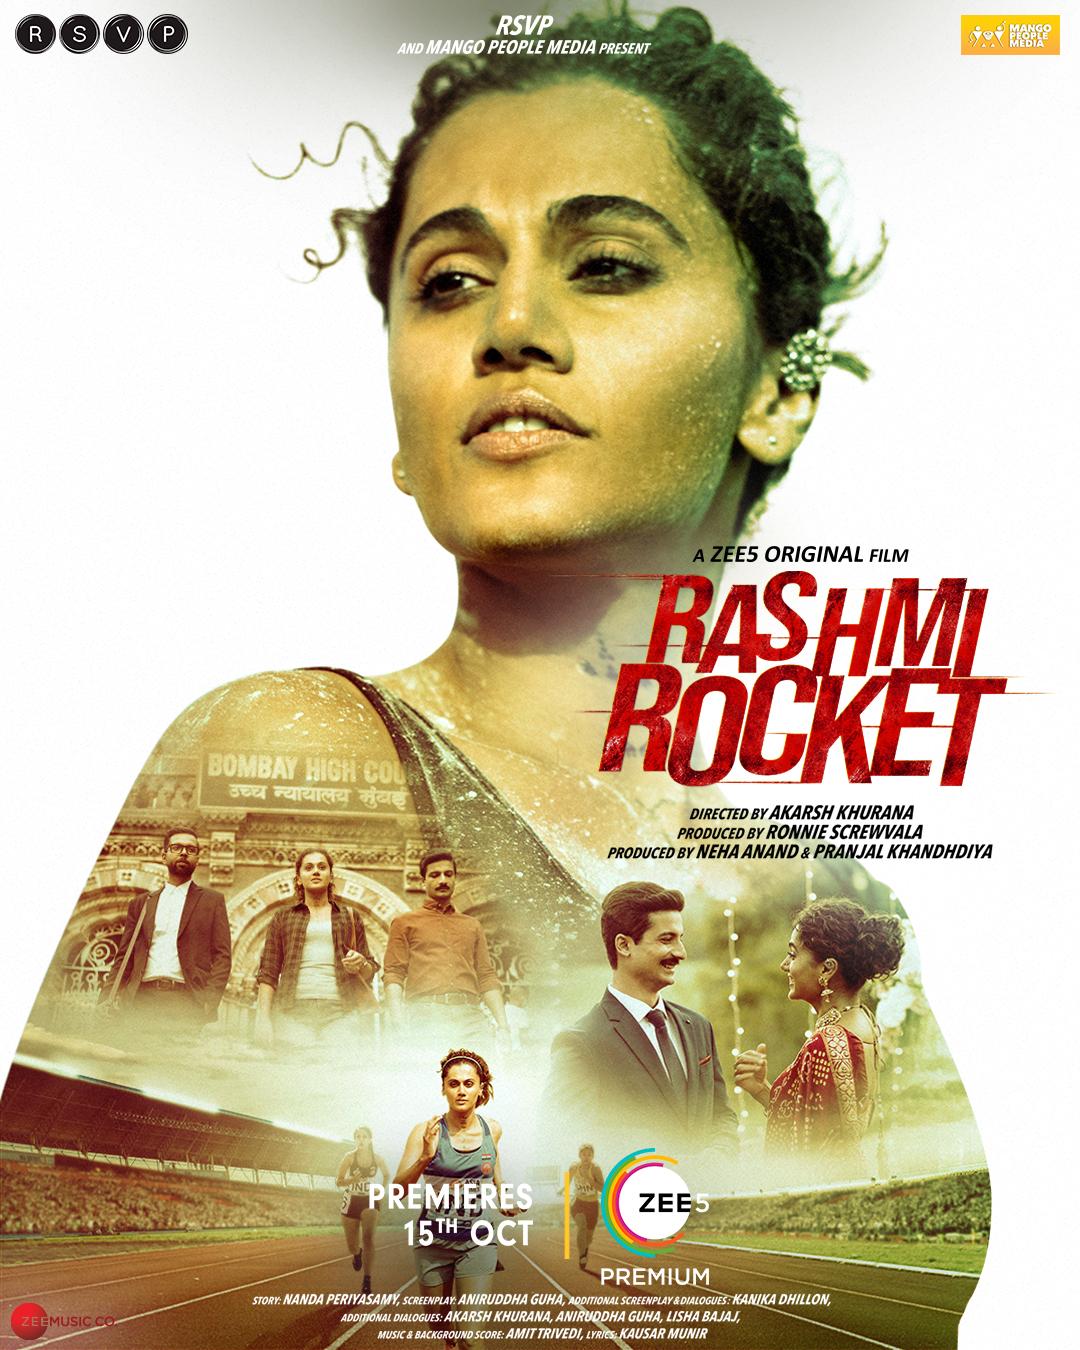 Rashmi Rocket (2021) New Hindi Movie HDRip 720p & 480p Download